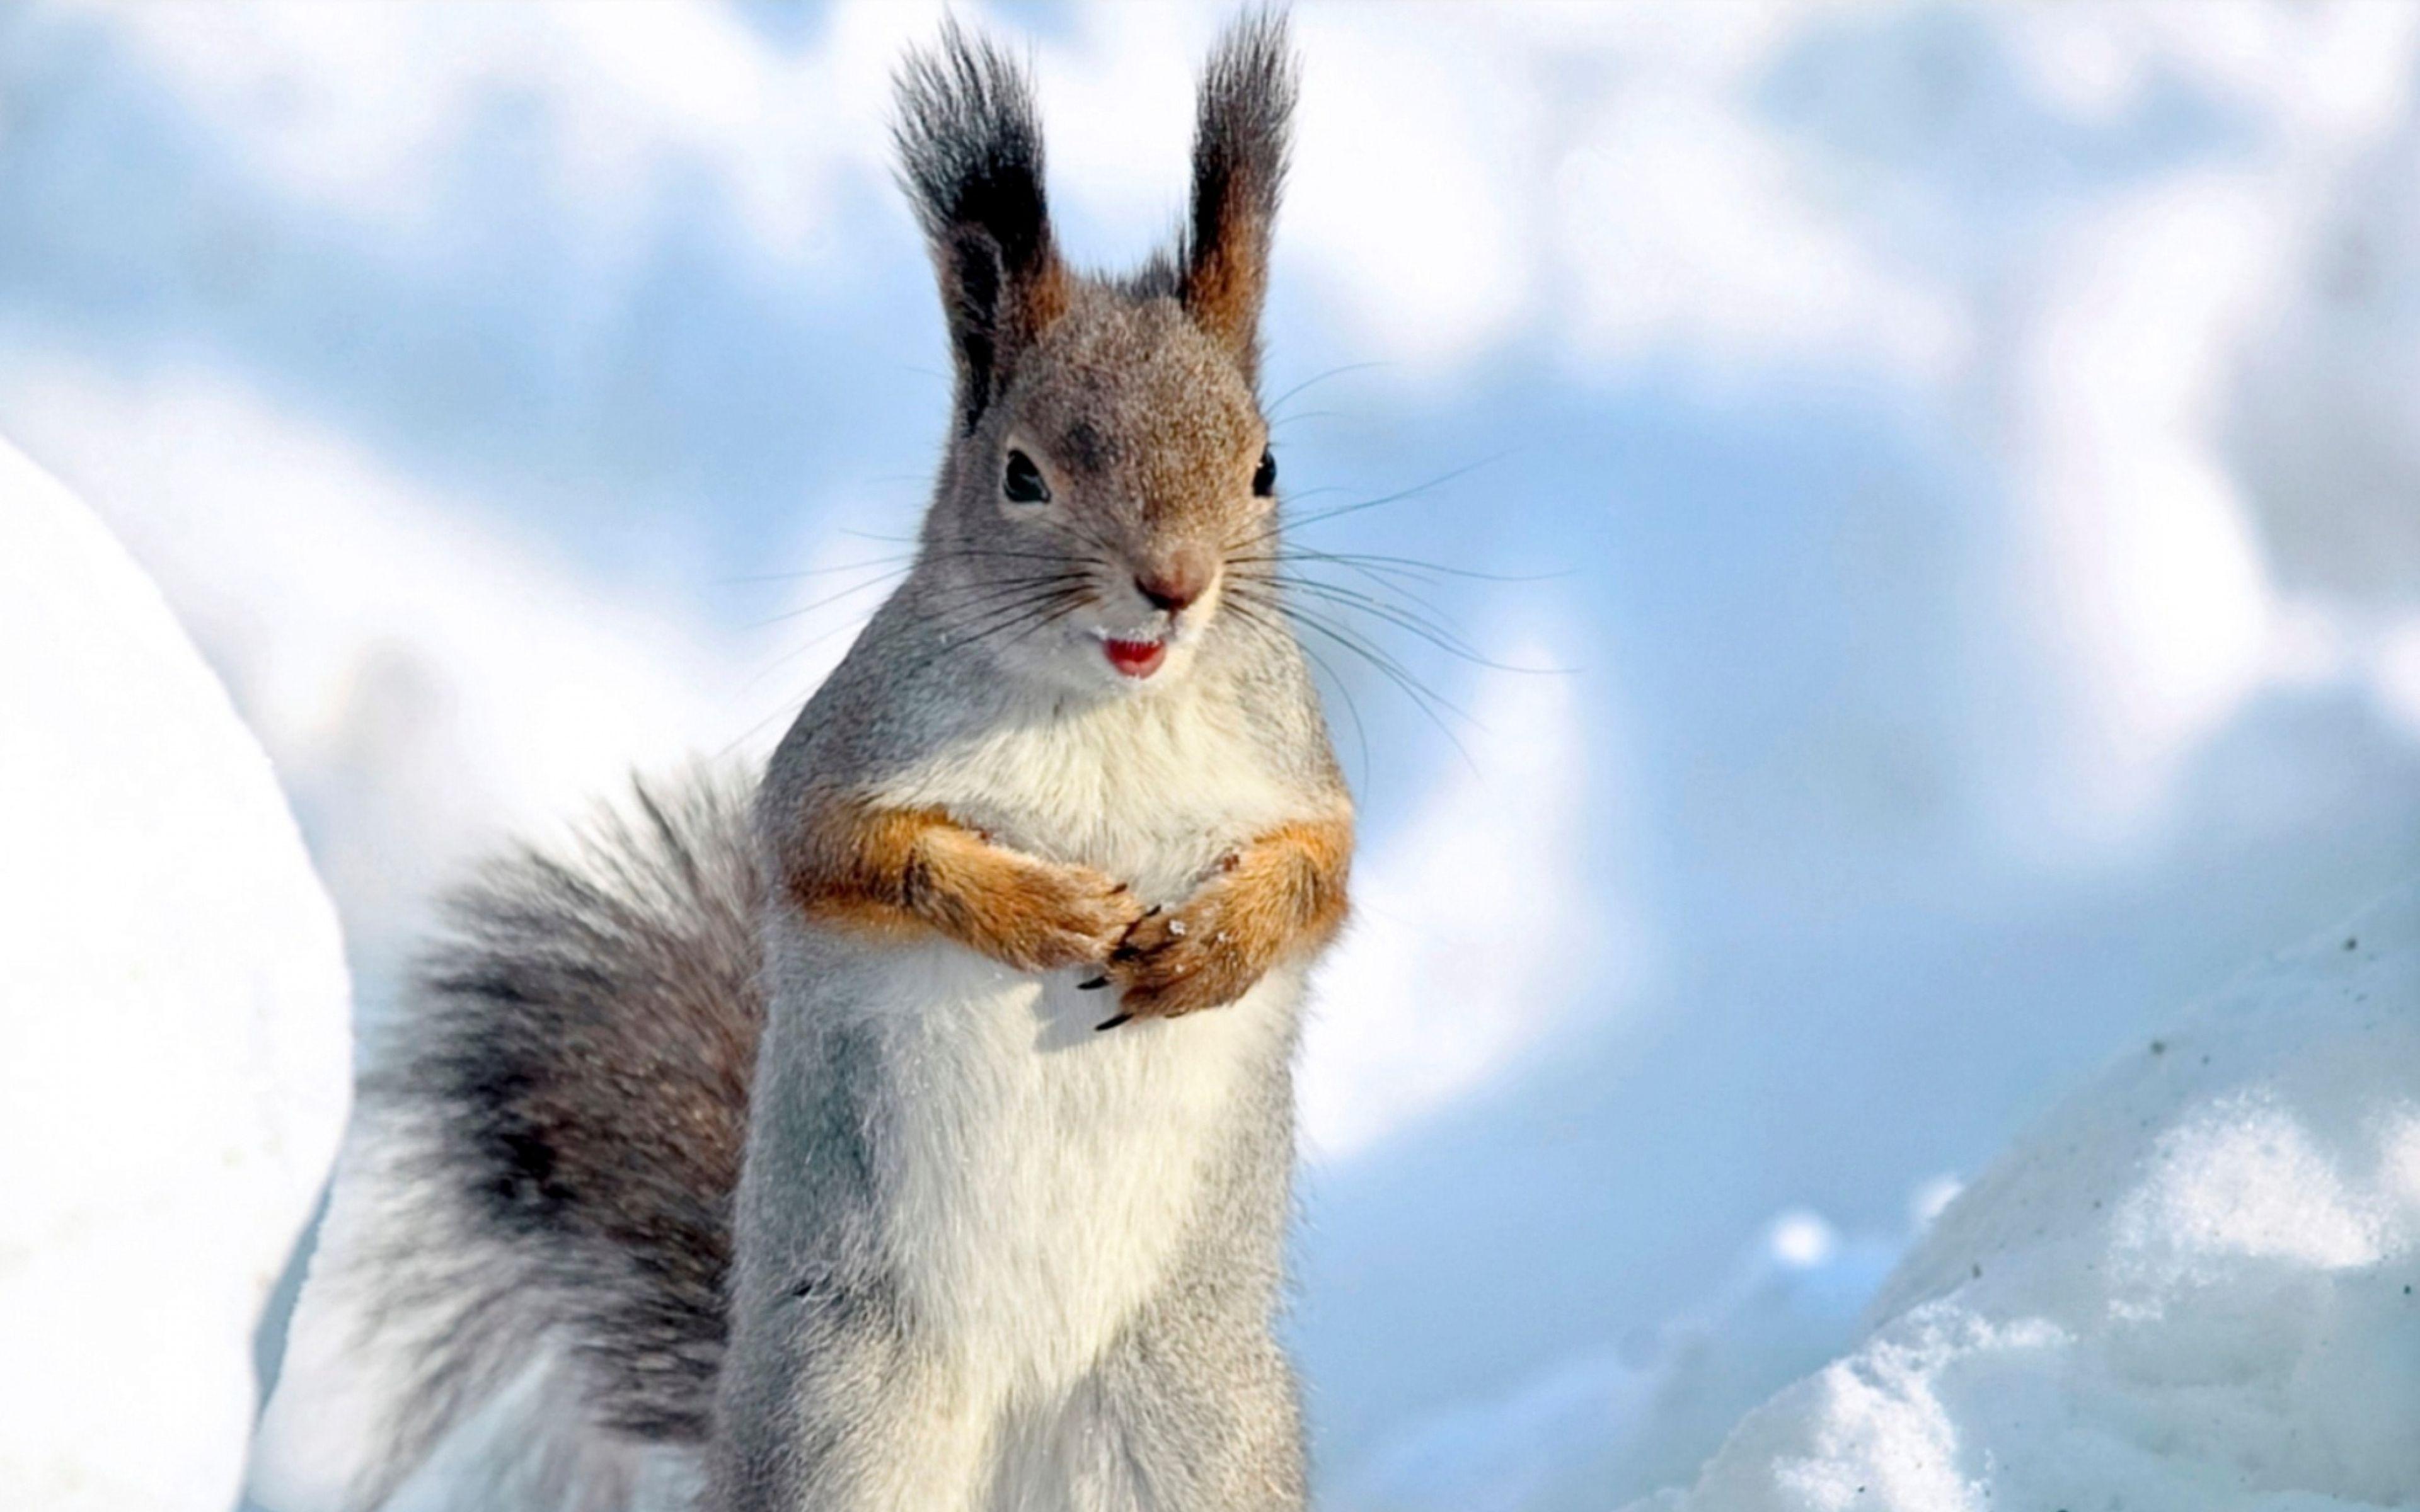 High Resolution Wallpaper Wildlife: Winter Animal Wallpapers High Resolution